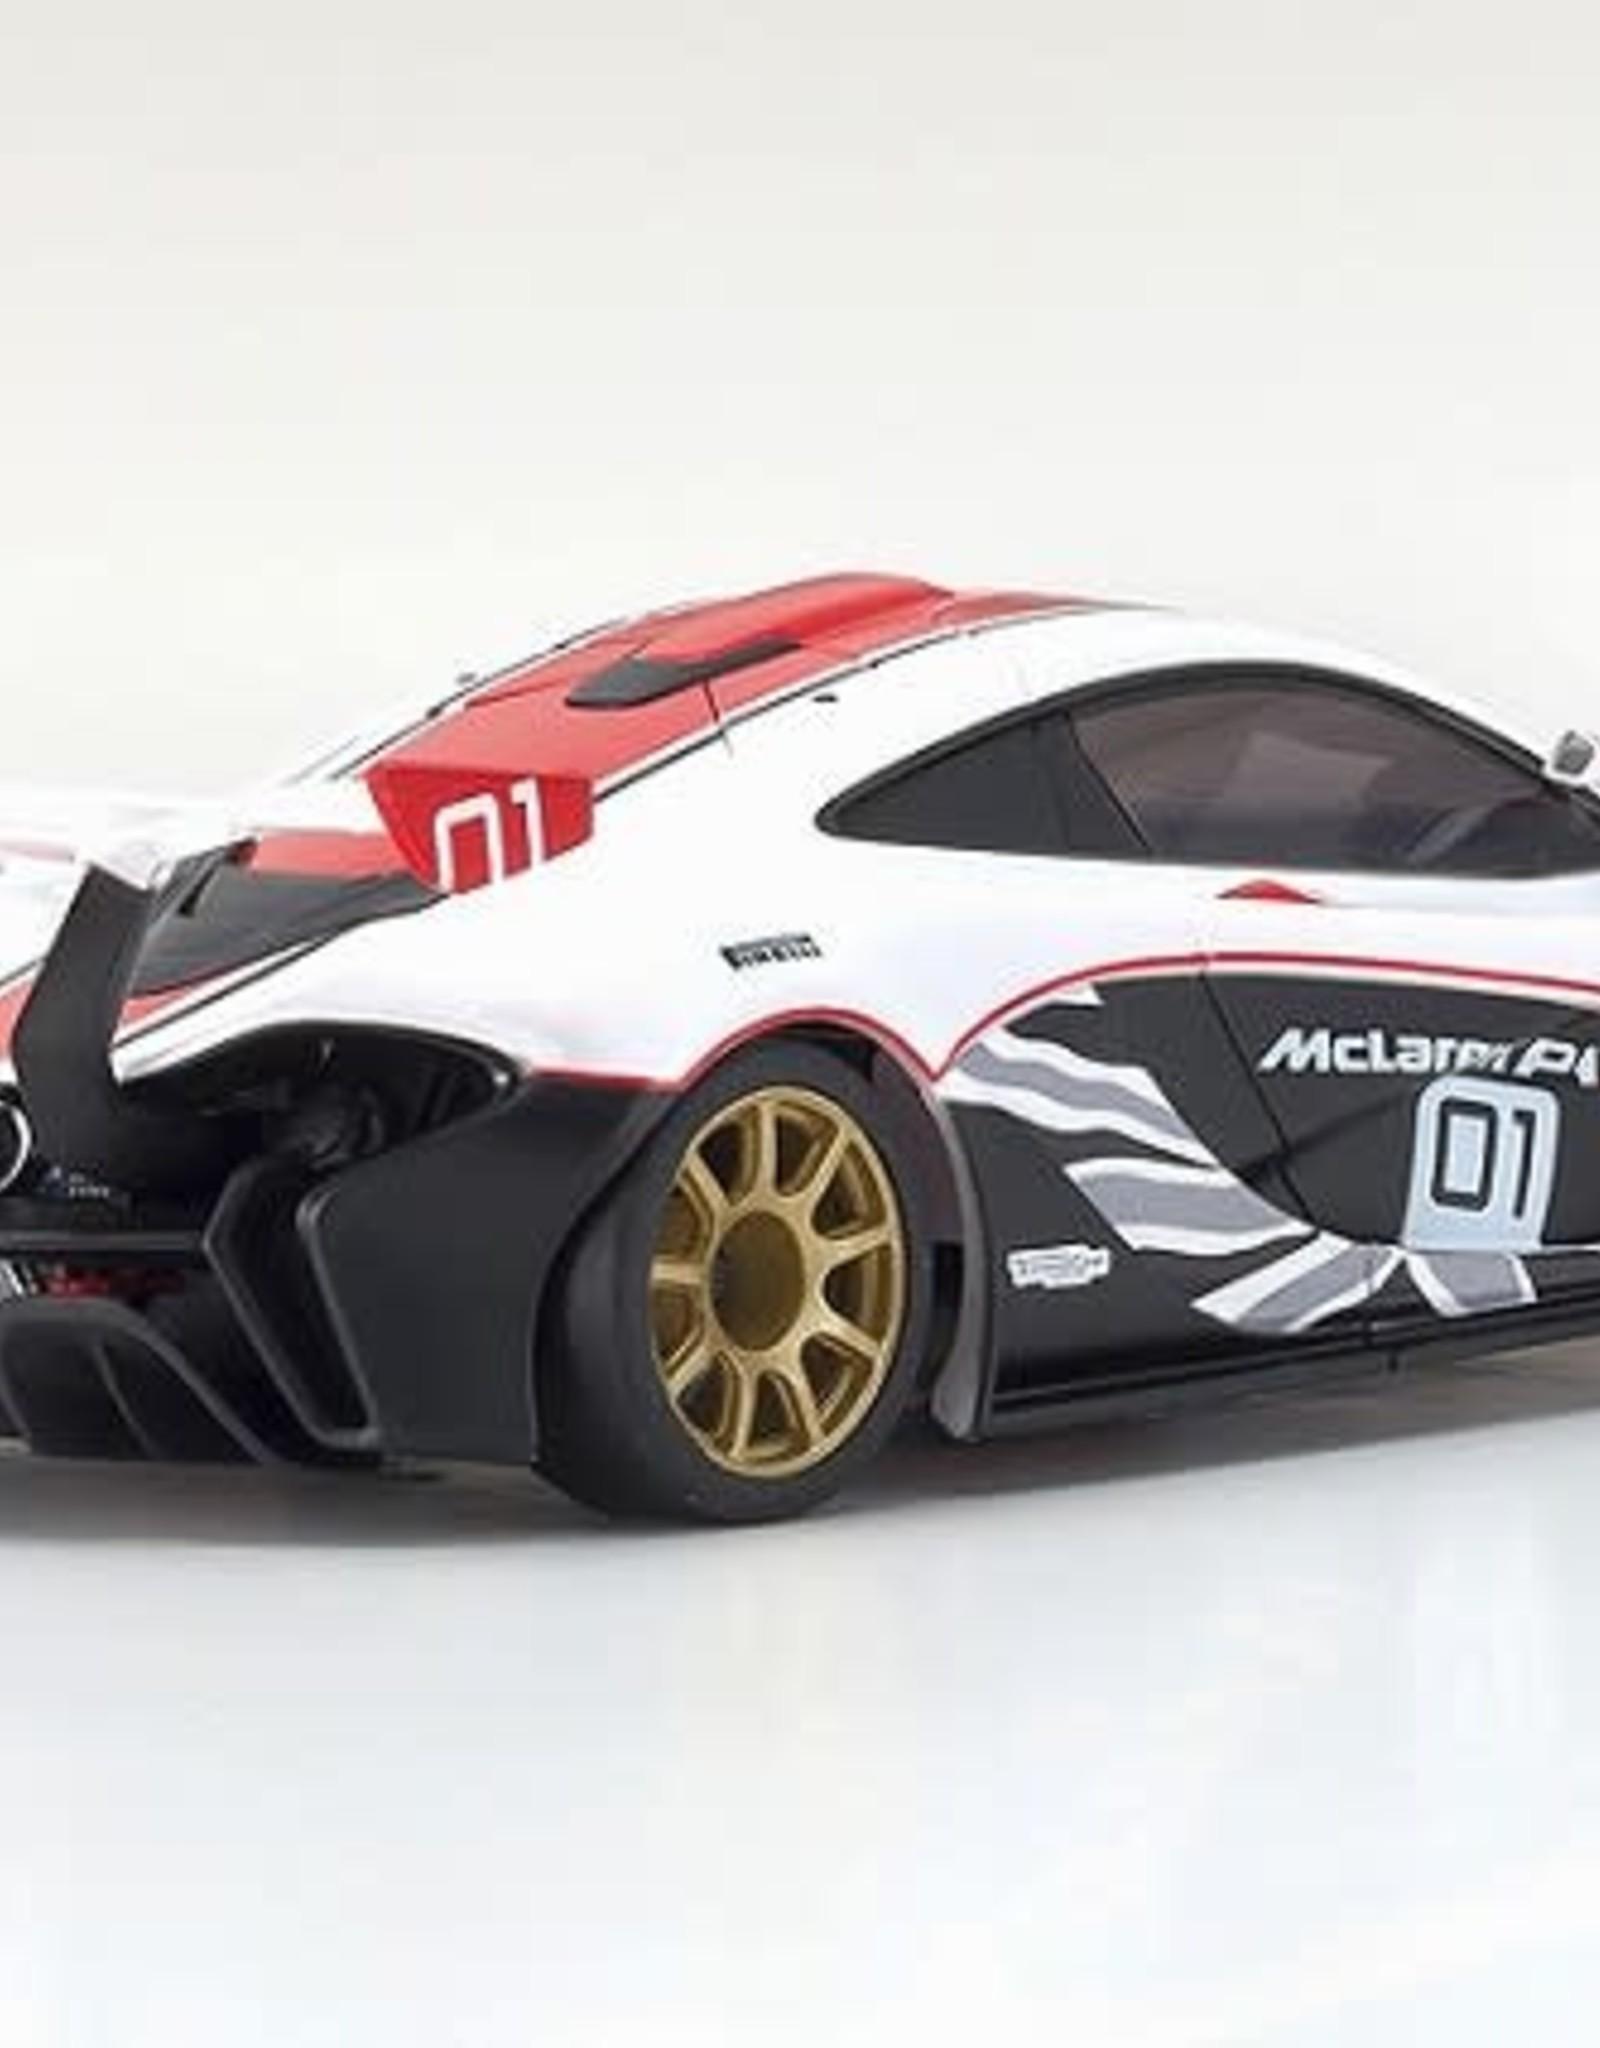 KYOSHO KYOMZP235WR ASC MR-03W-MM ASC McLaren P1 GTR White/Red